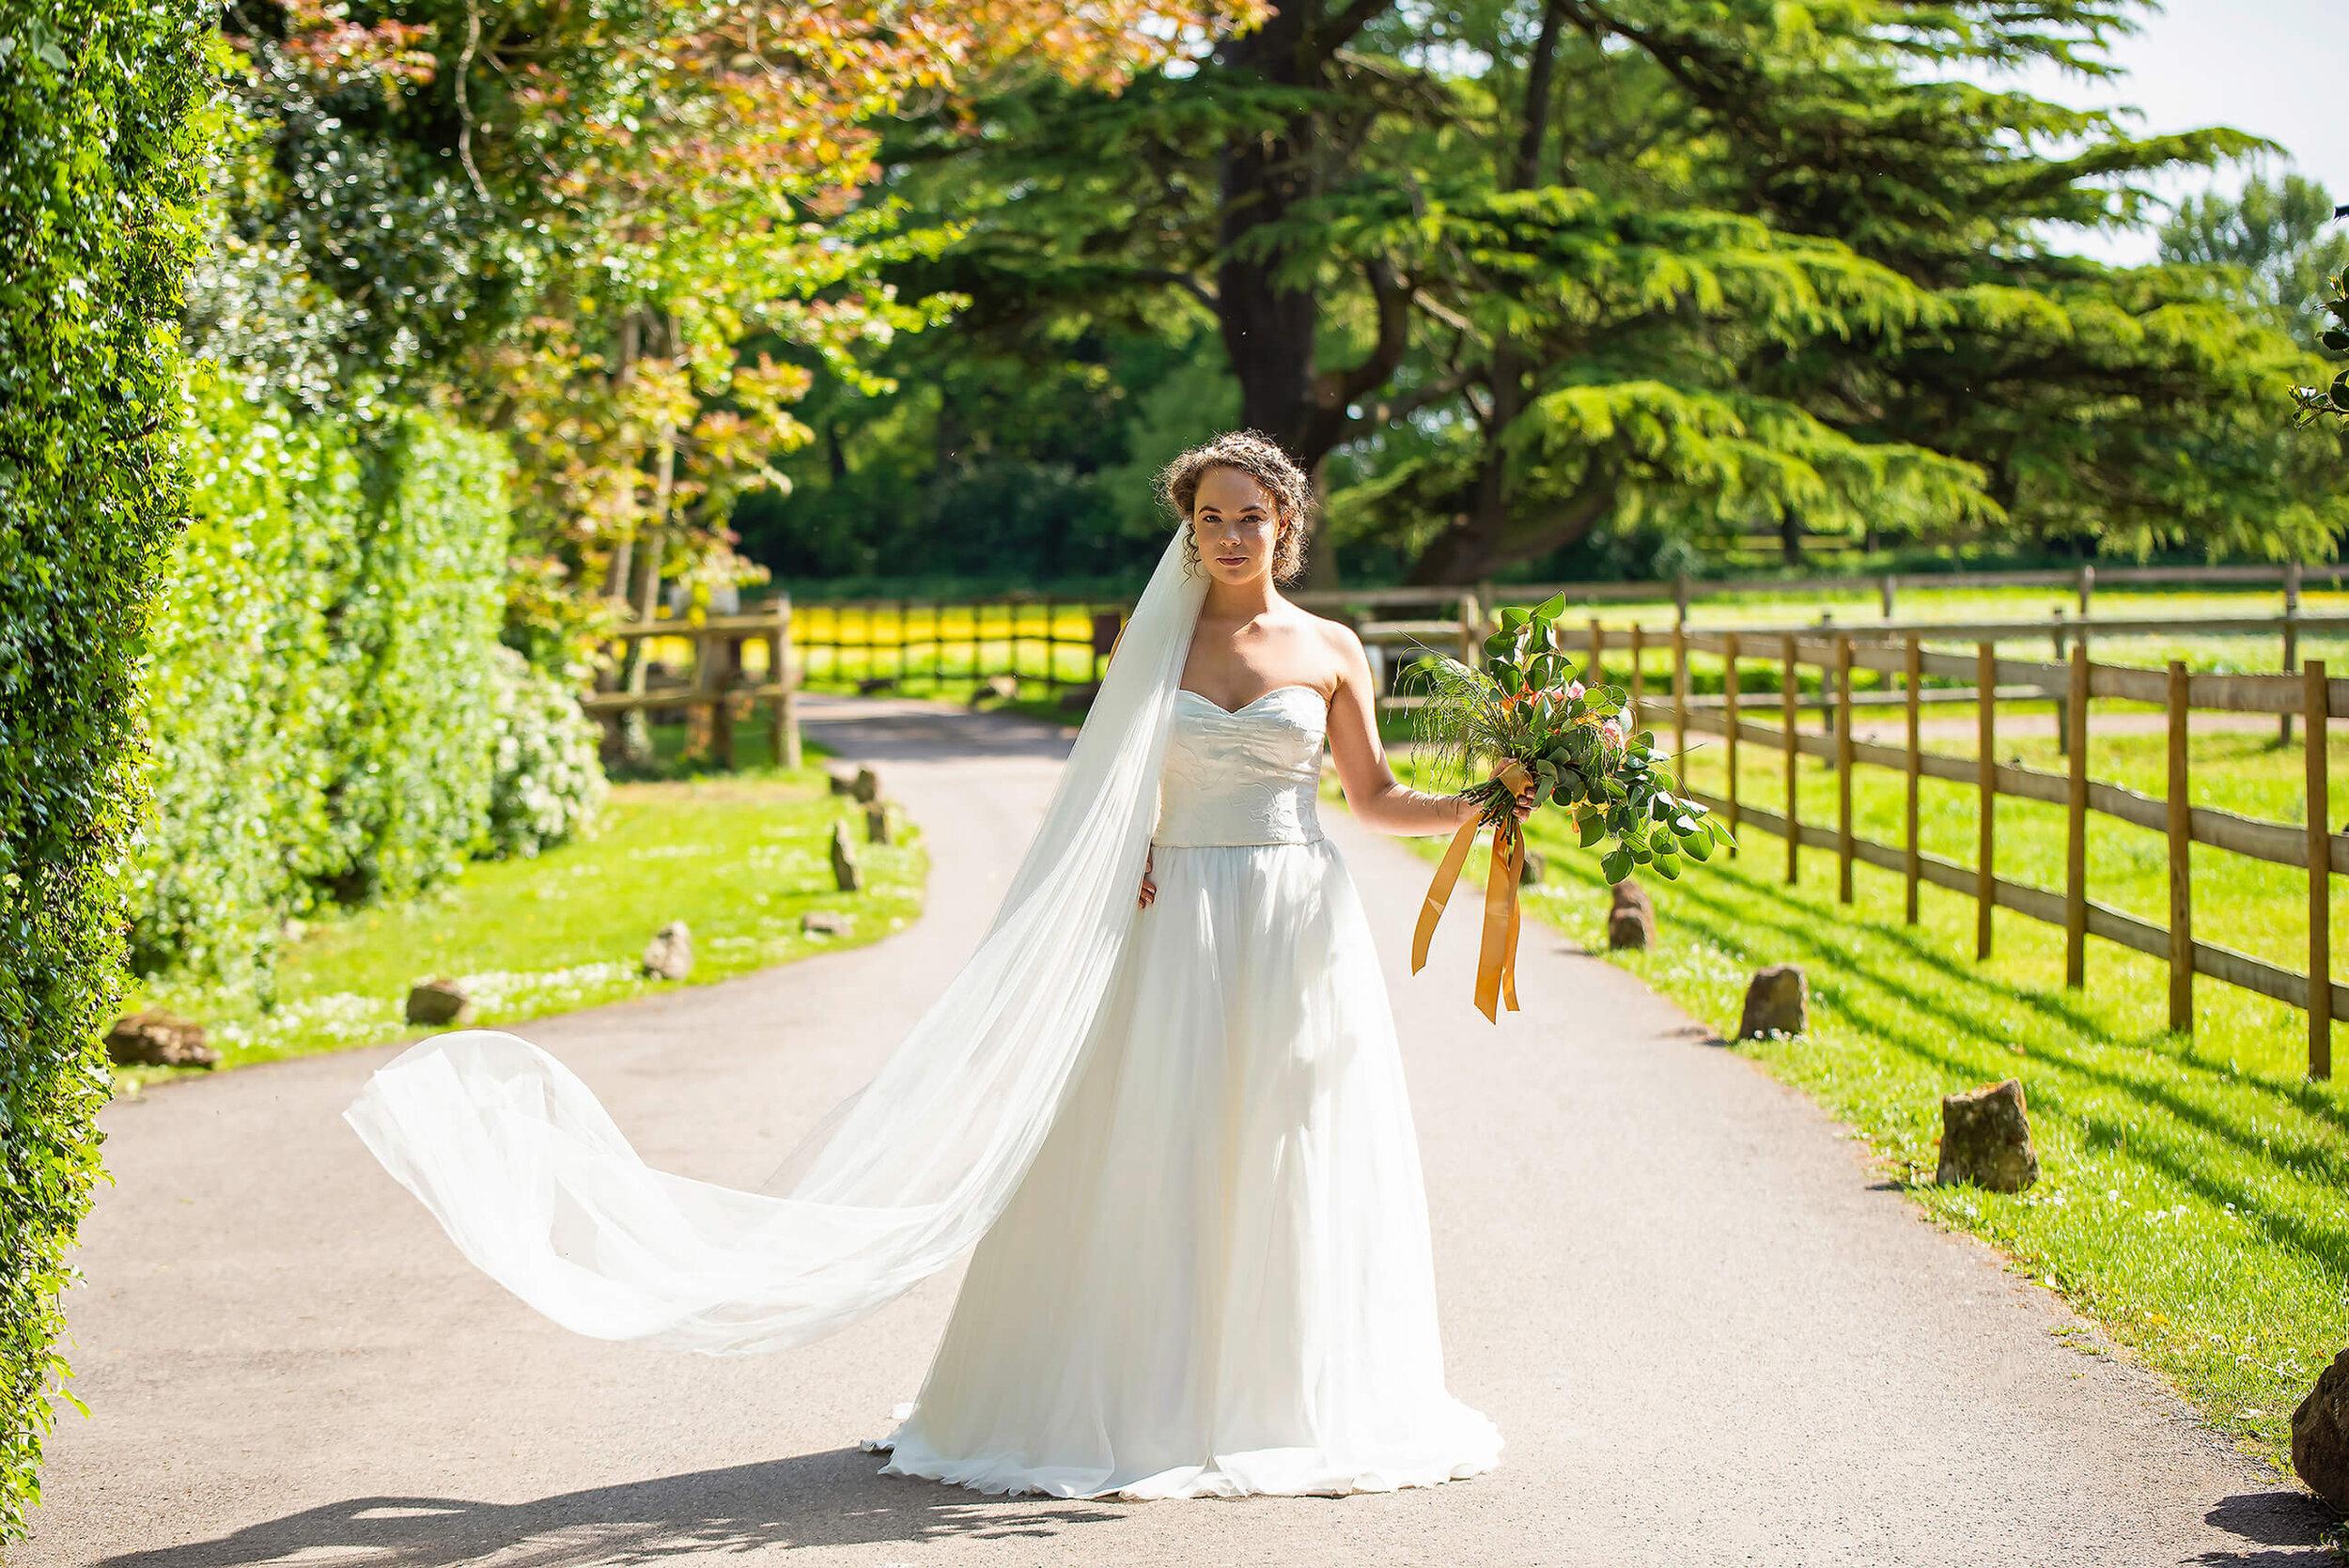 Bride in Oui Madam Bridal Atelier dress, with Davina Simone Weddings floral and foliage bouquet, Sash & Veil Bridal veil, and PS With Love Bridal Hair Piece, at Nurstead Court Wedding Venue, Kent.